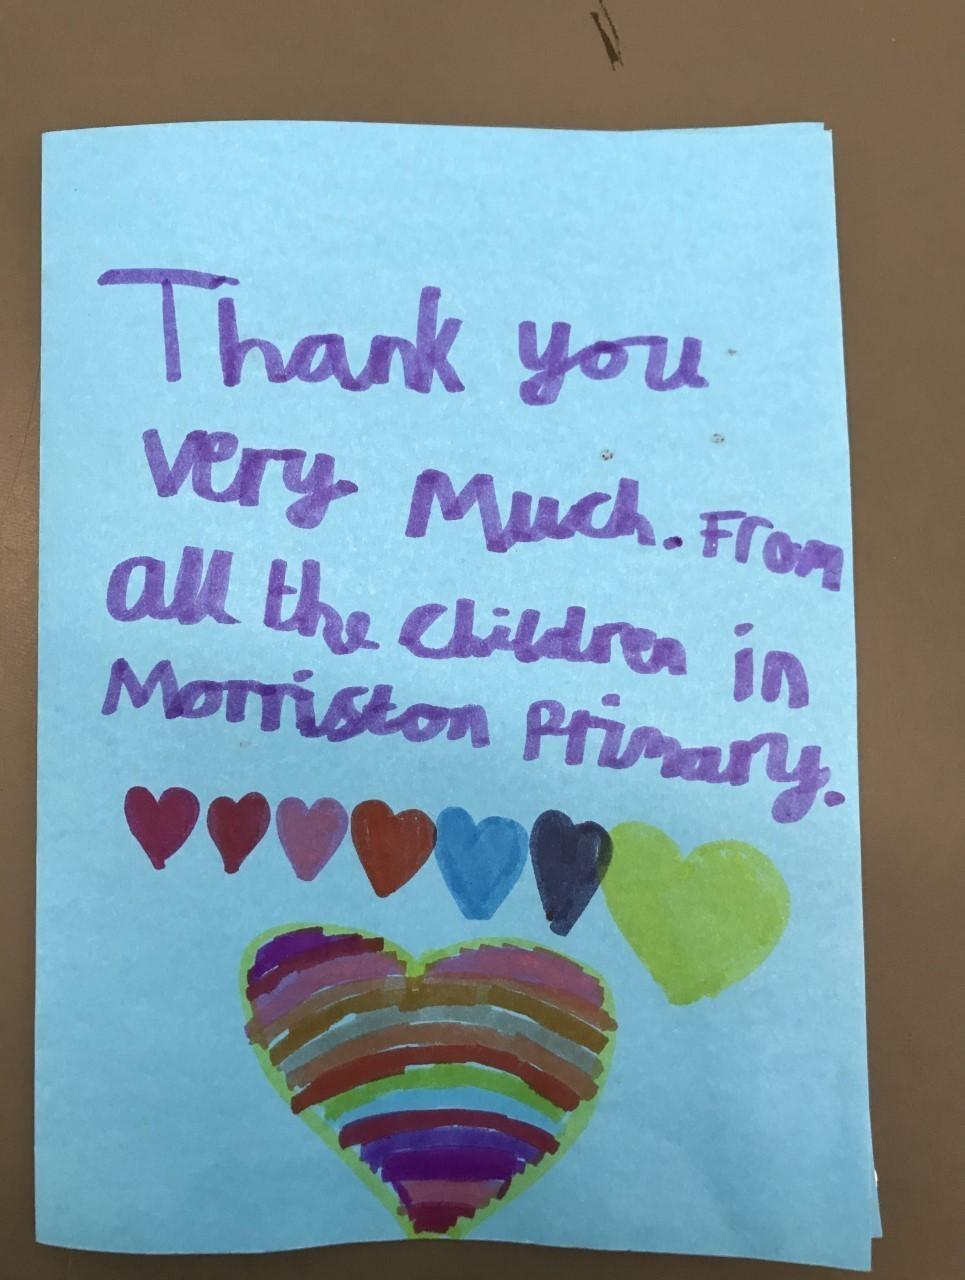 Thank you card from school | Asda Swansea